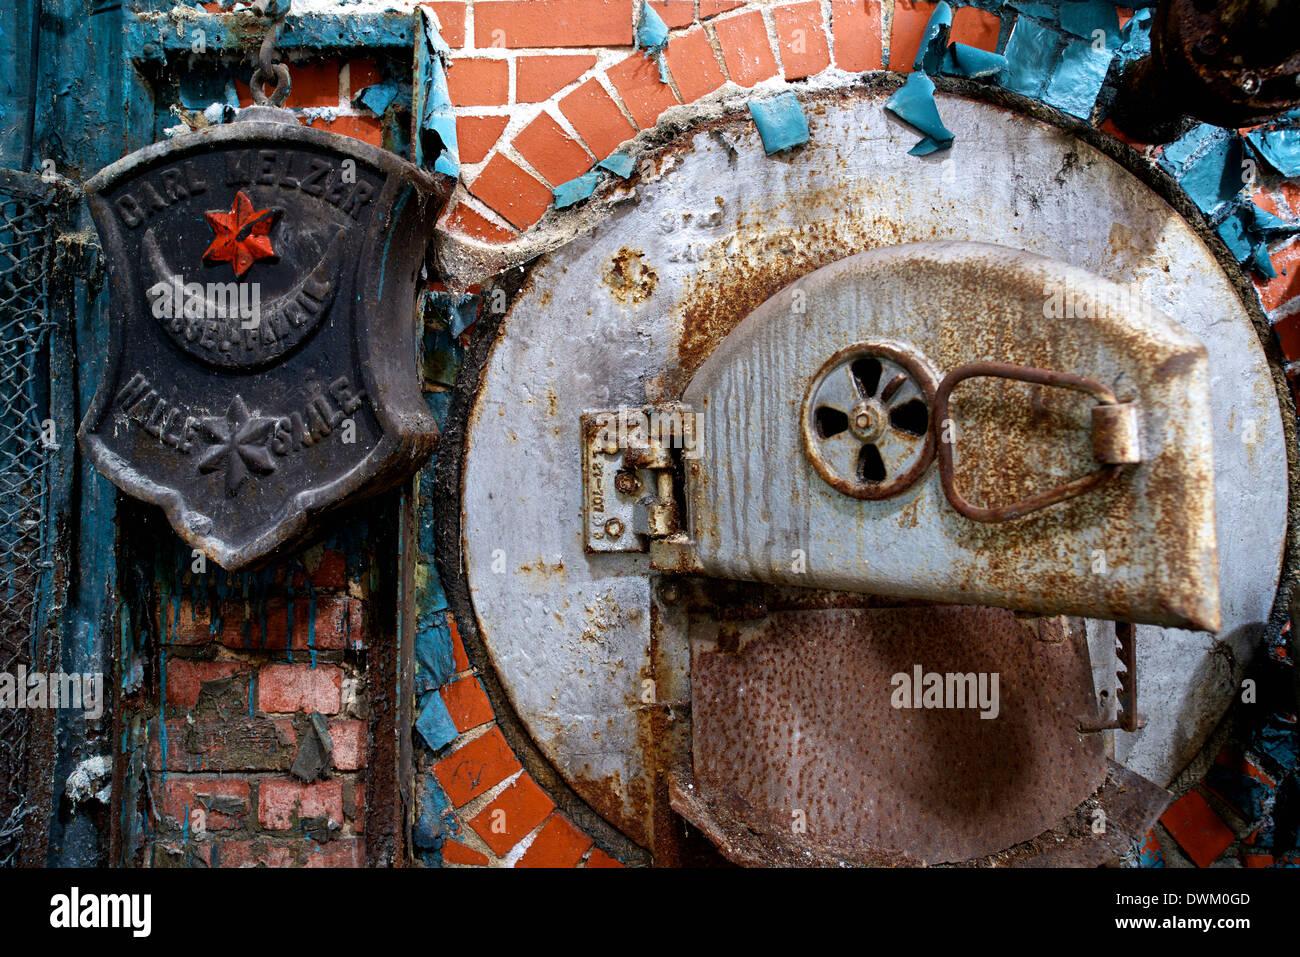 Kessel Stock Photos & Kessel Stock Images - Alamy